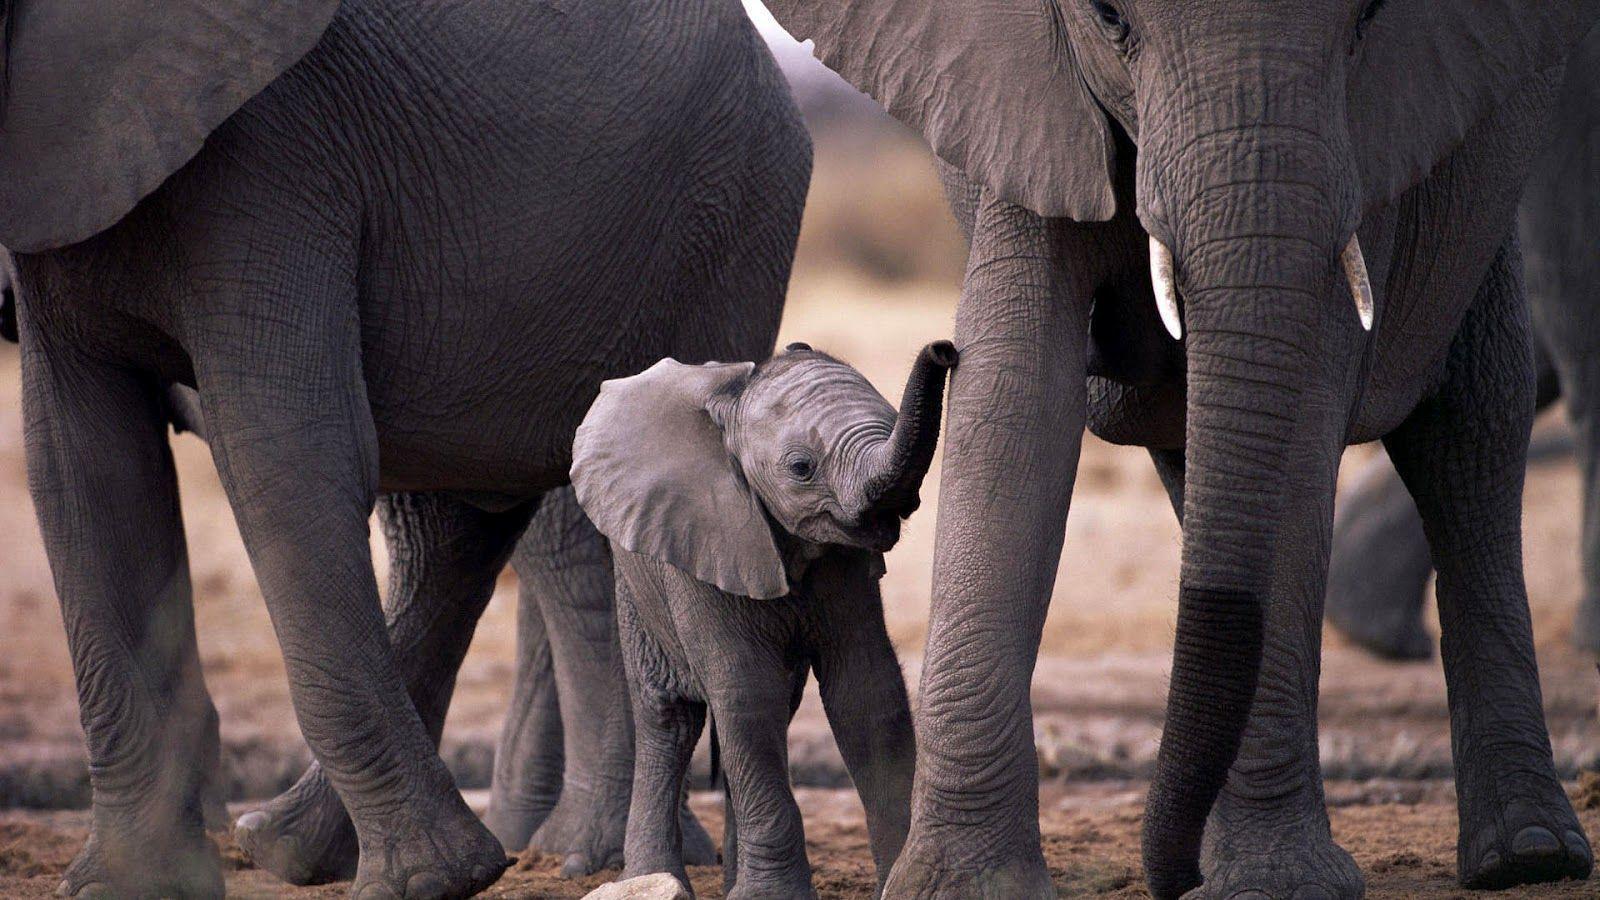 Baby elephants wallpaper - photo#48